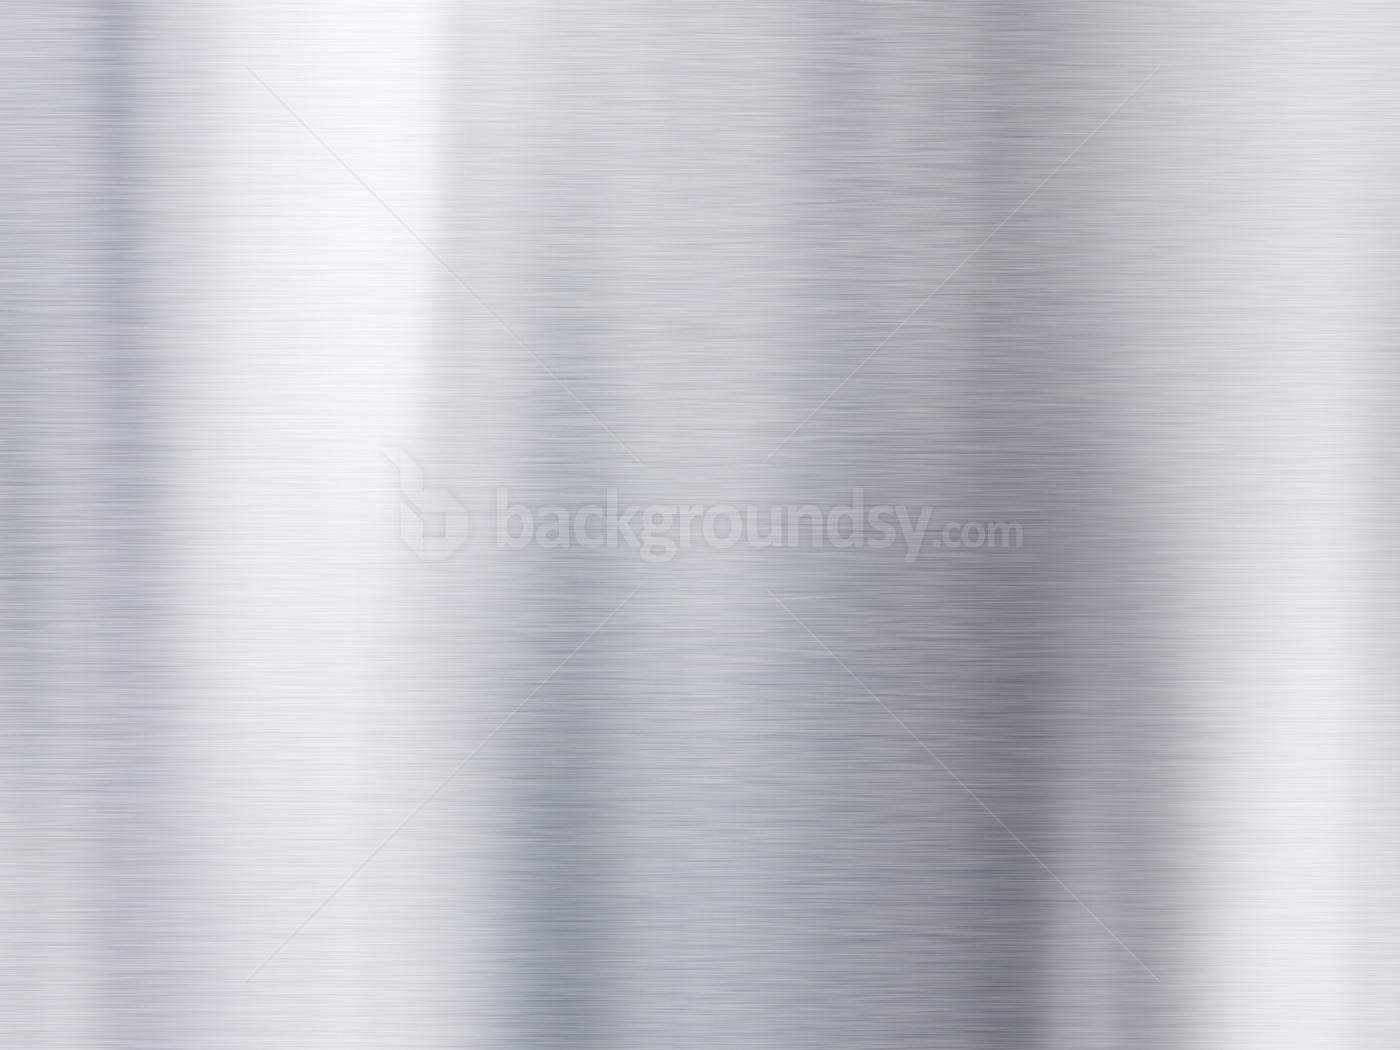 Silver background Backgroundsycom 1400x1050